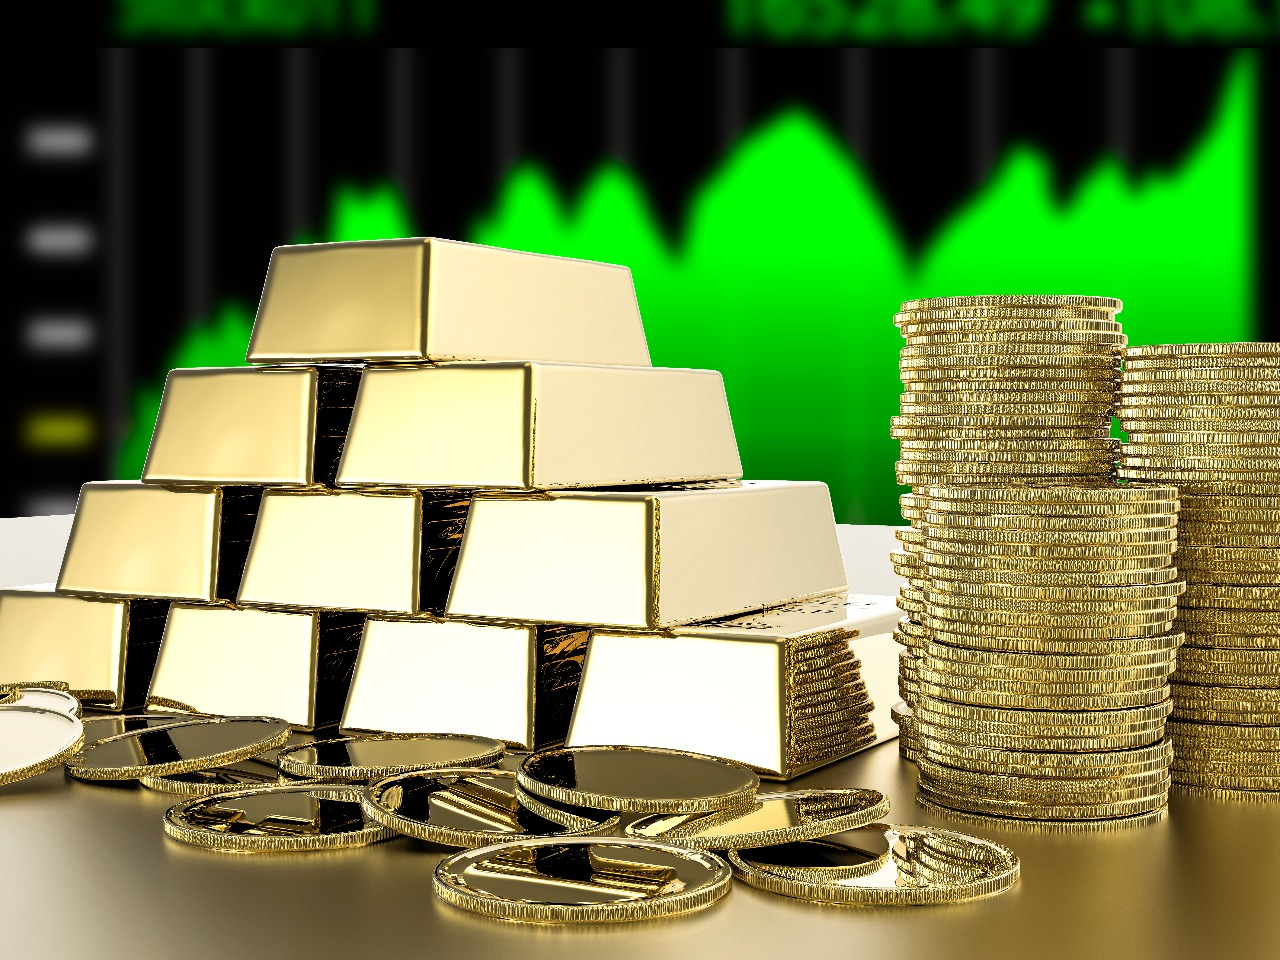 https: img.okezone.com content 2020 07 01 320 2239232 harga-emas-berjangka-tembus-level-tertinggi-sejak-2011-RyICPk02iP.jpg